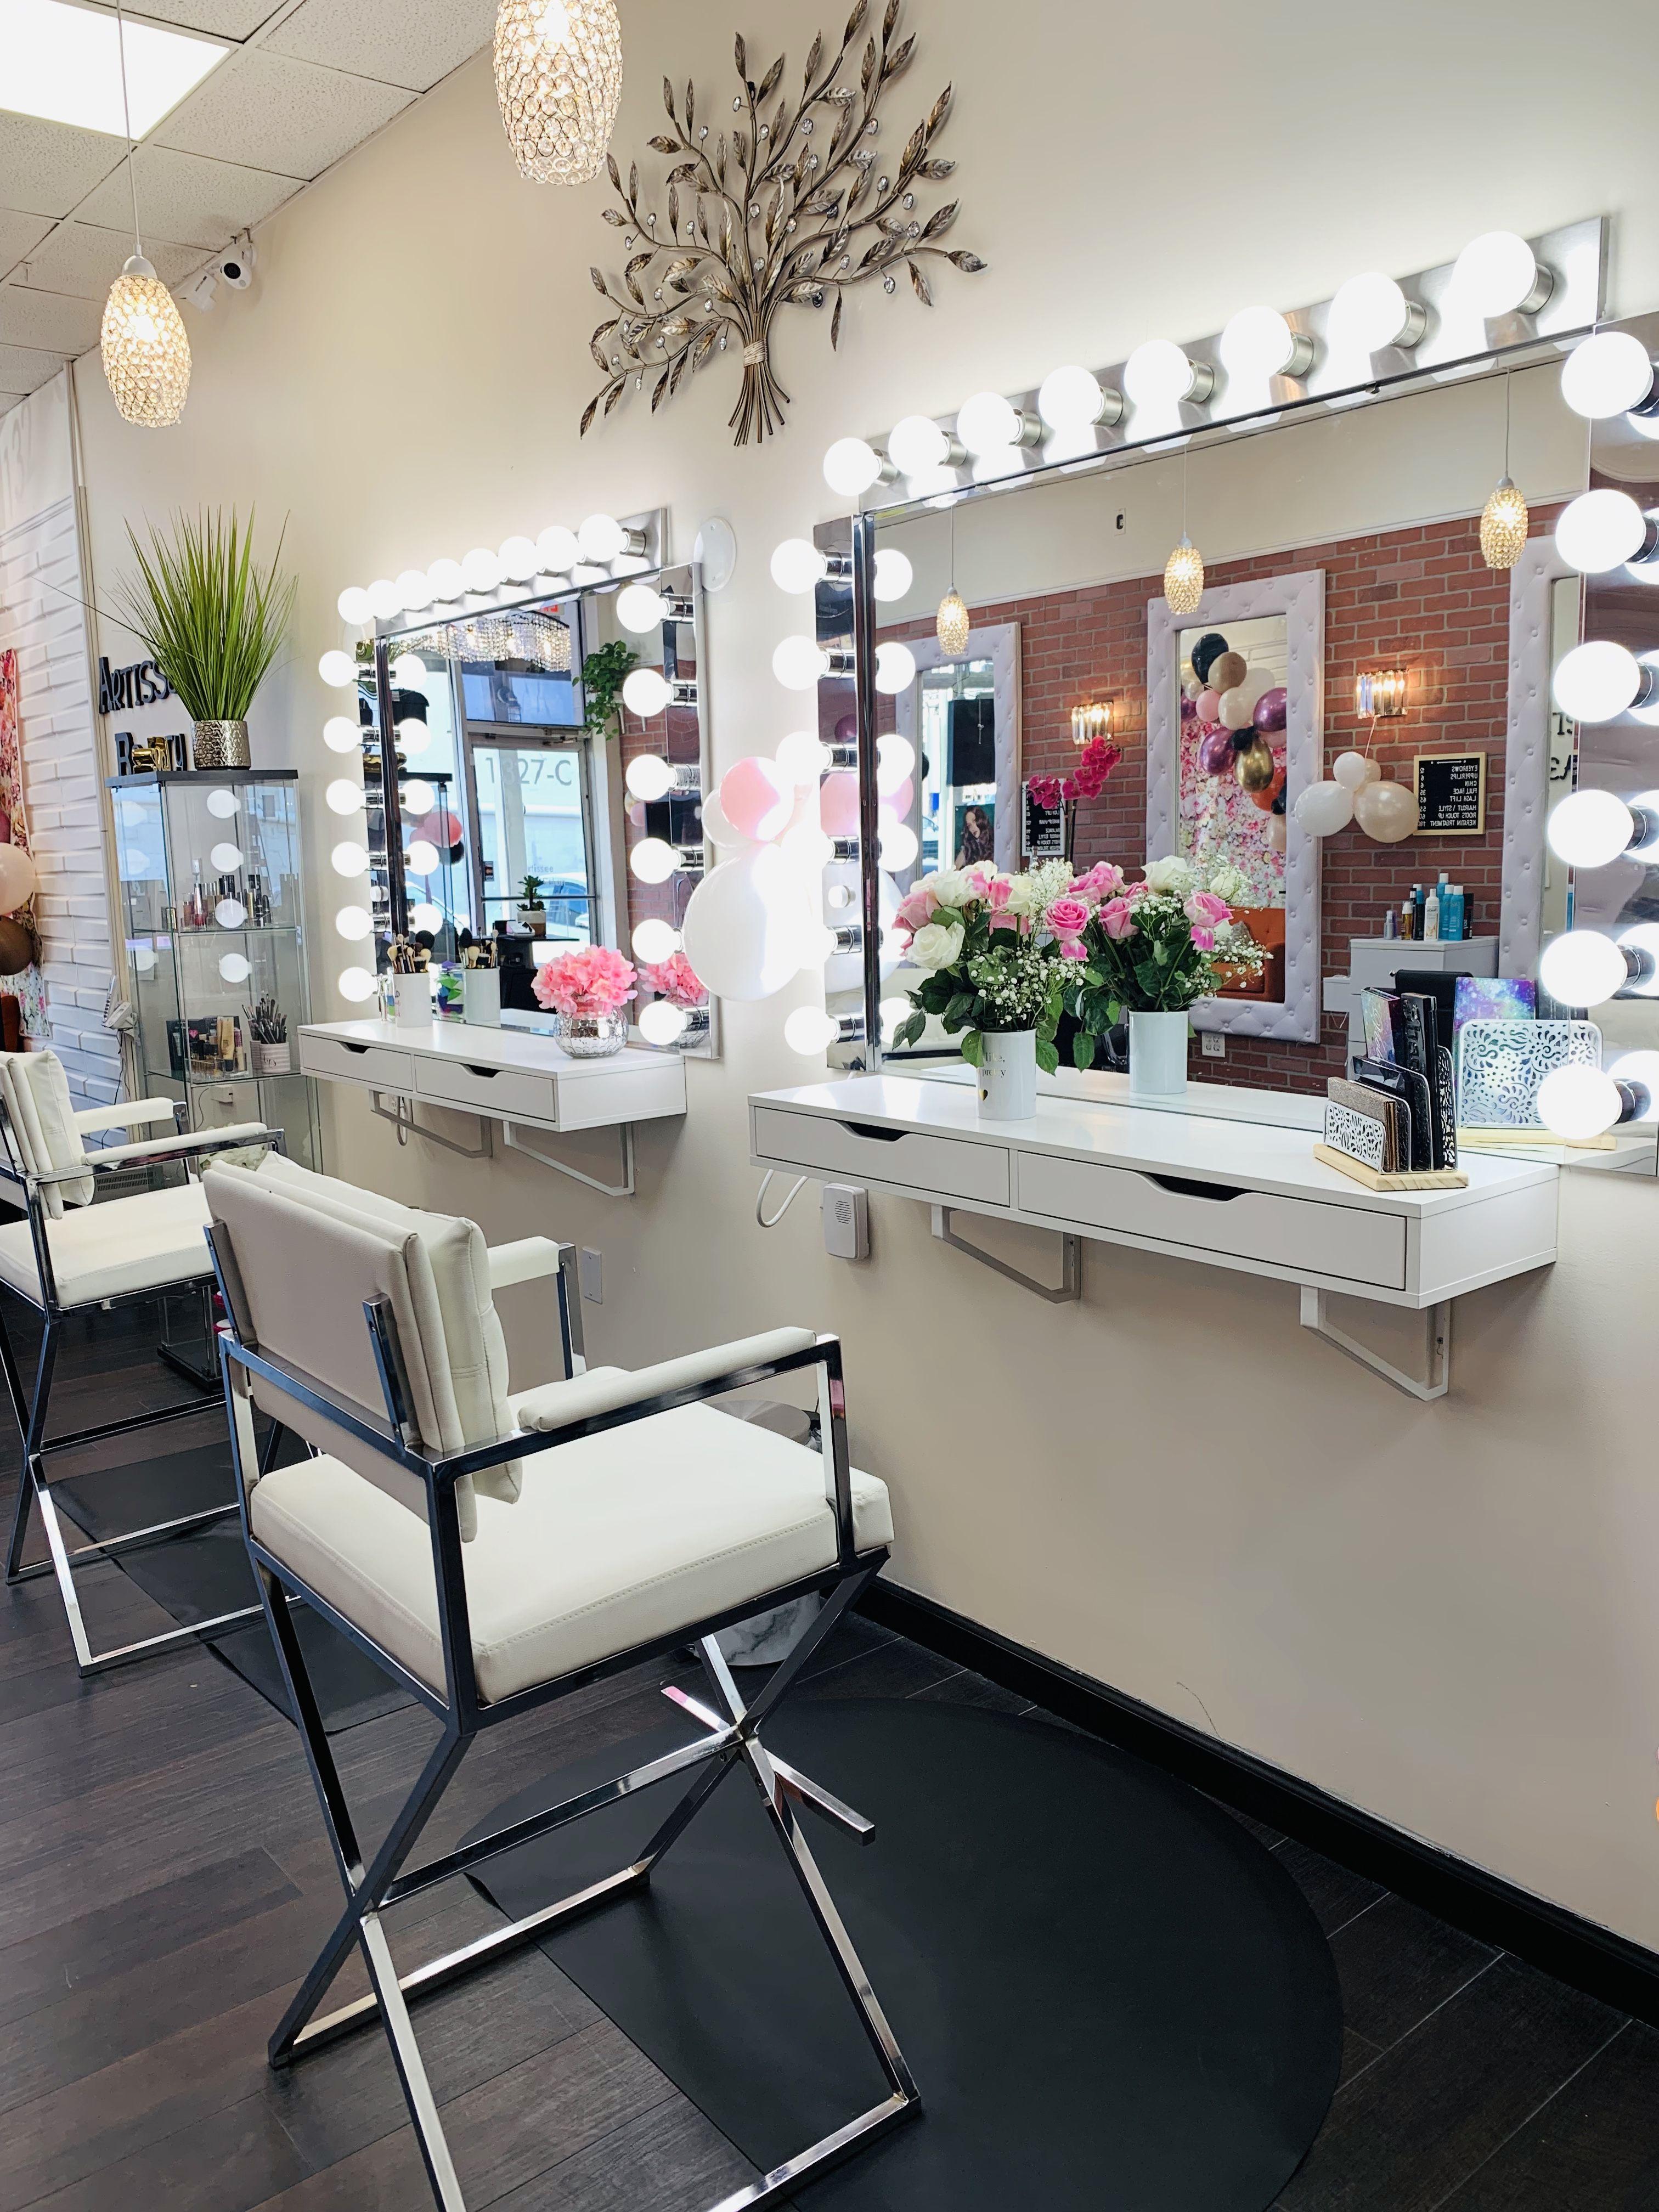 Chic makeup studio decor idea  Makeup studio decor, Makeup room